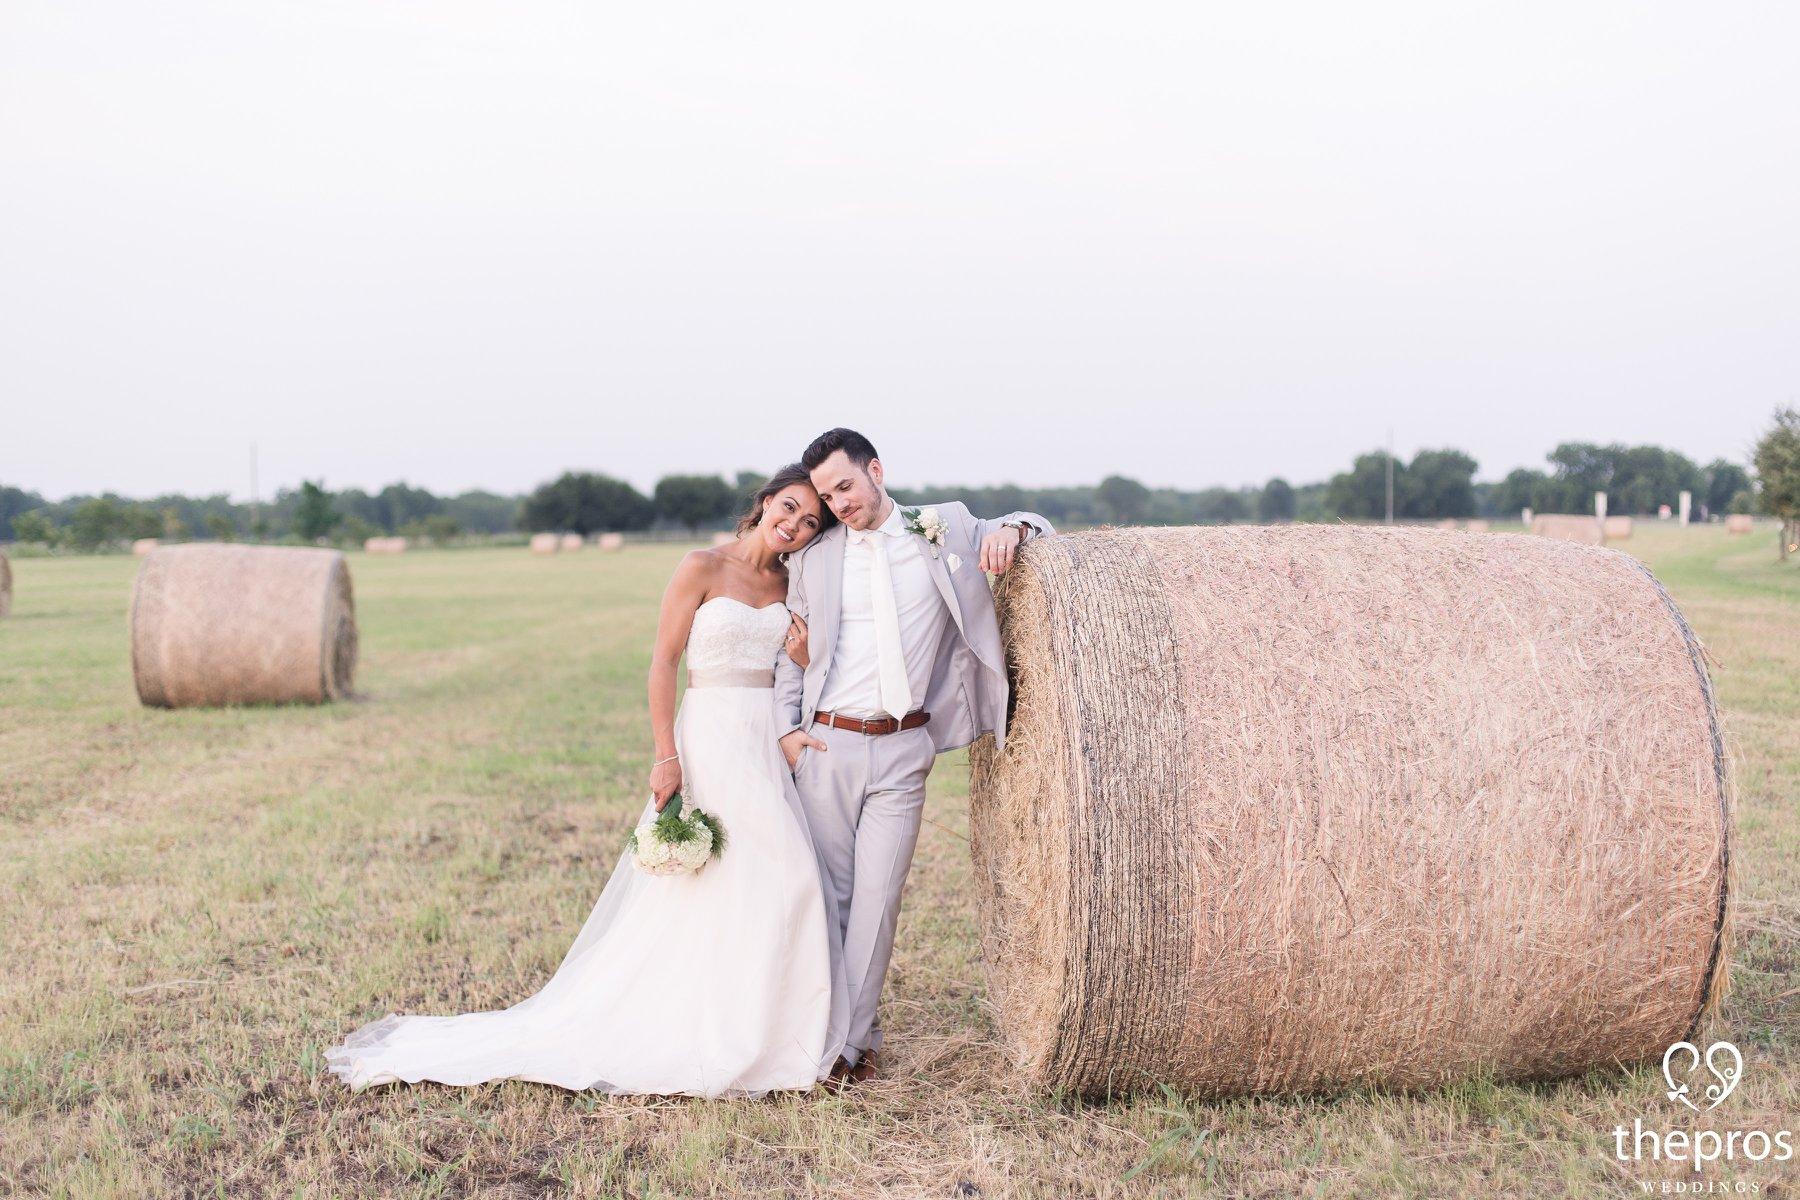 753-The Pros weddings